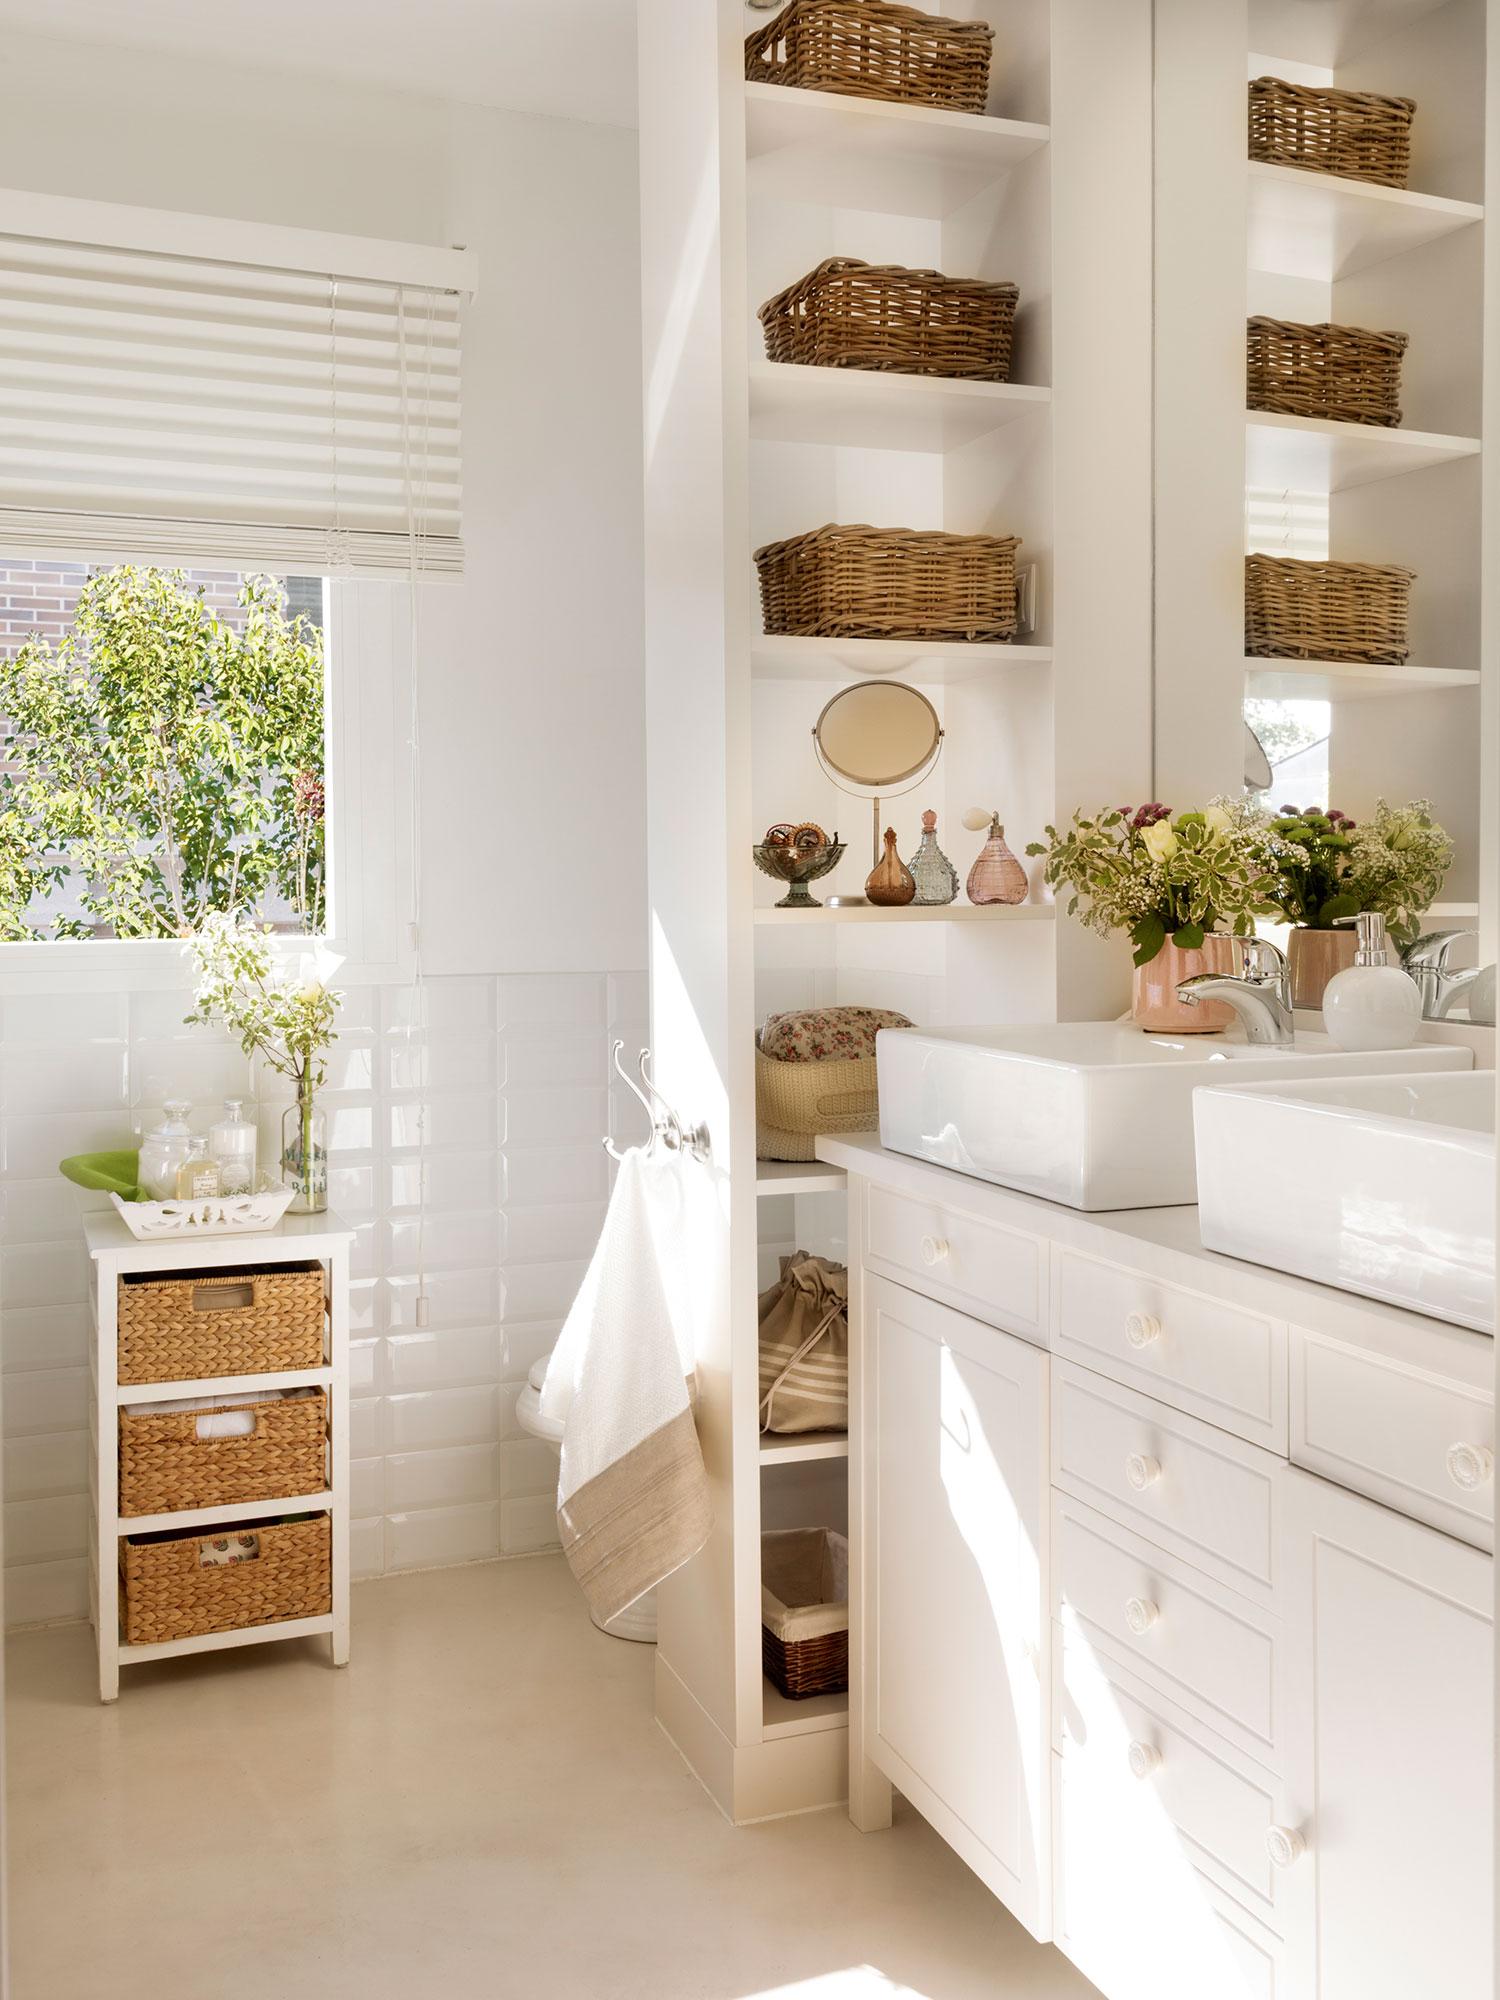 Baos en blanco ideas de decoracin